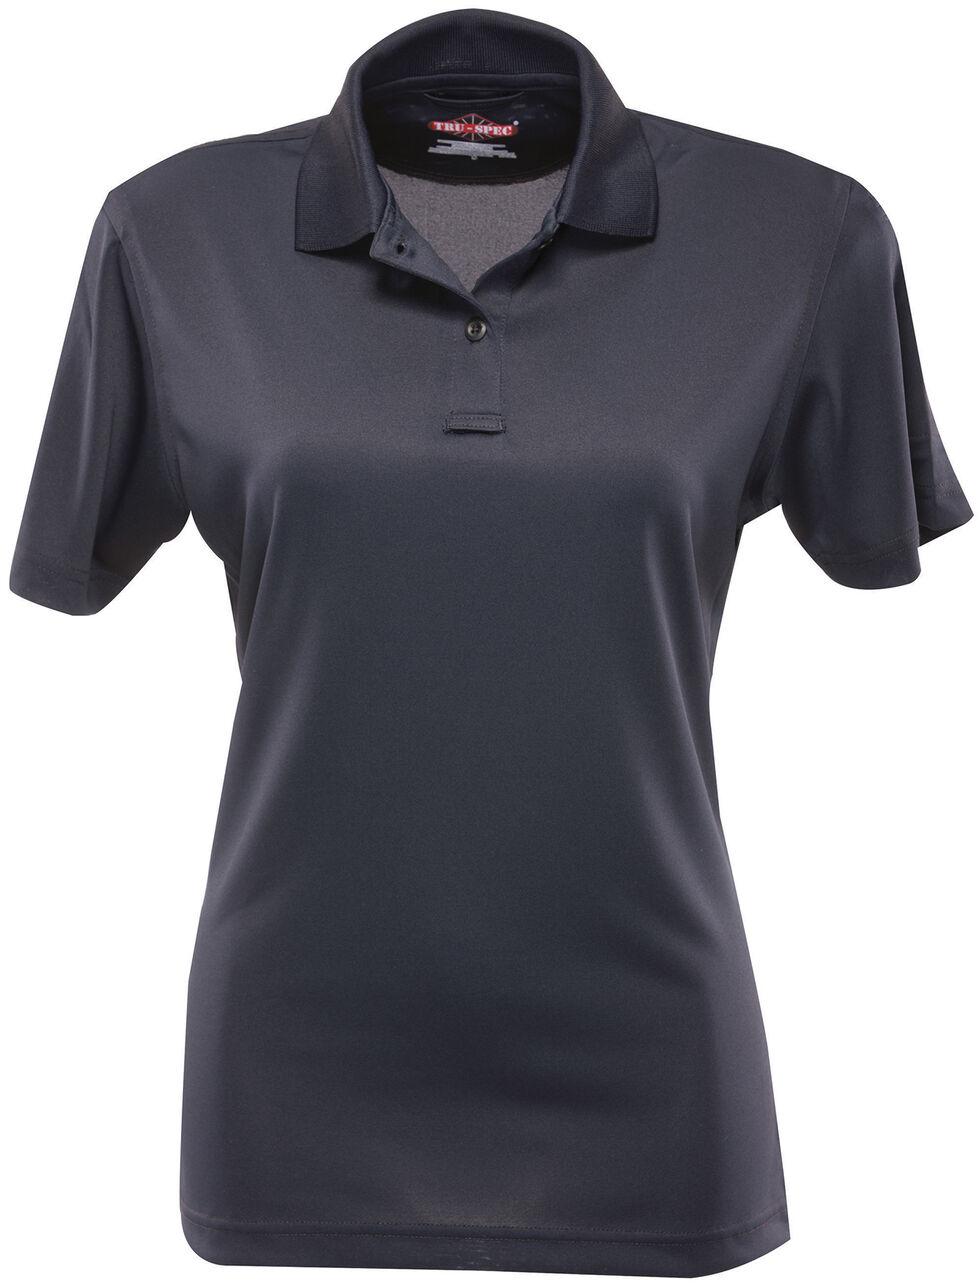 Tru-Spec Women's 24-7 Series Performance Polo Shirt, Navy, hi-res